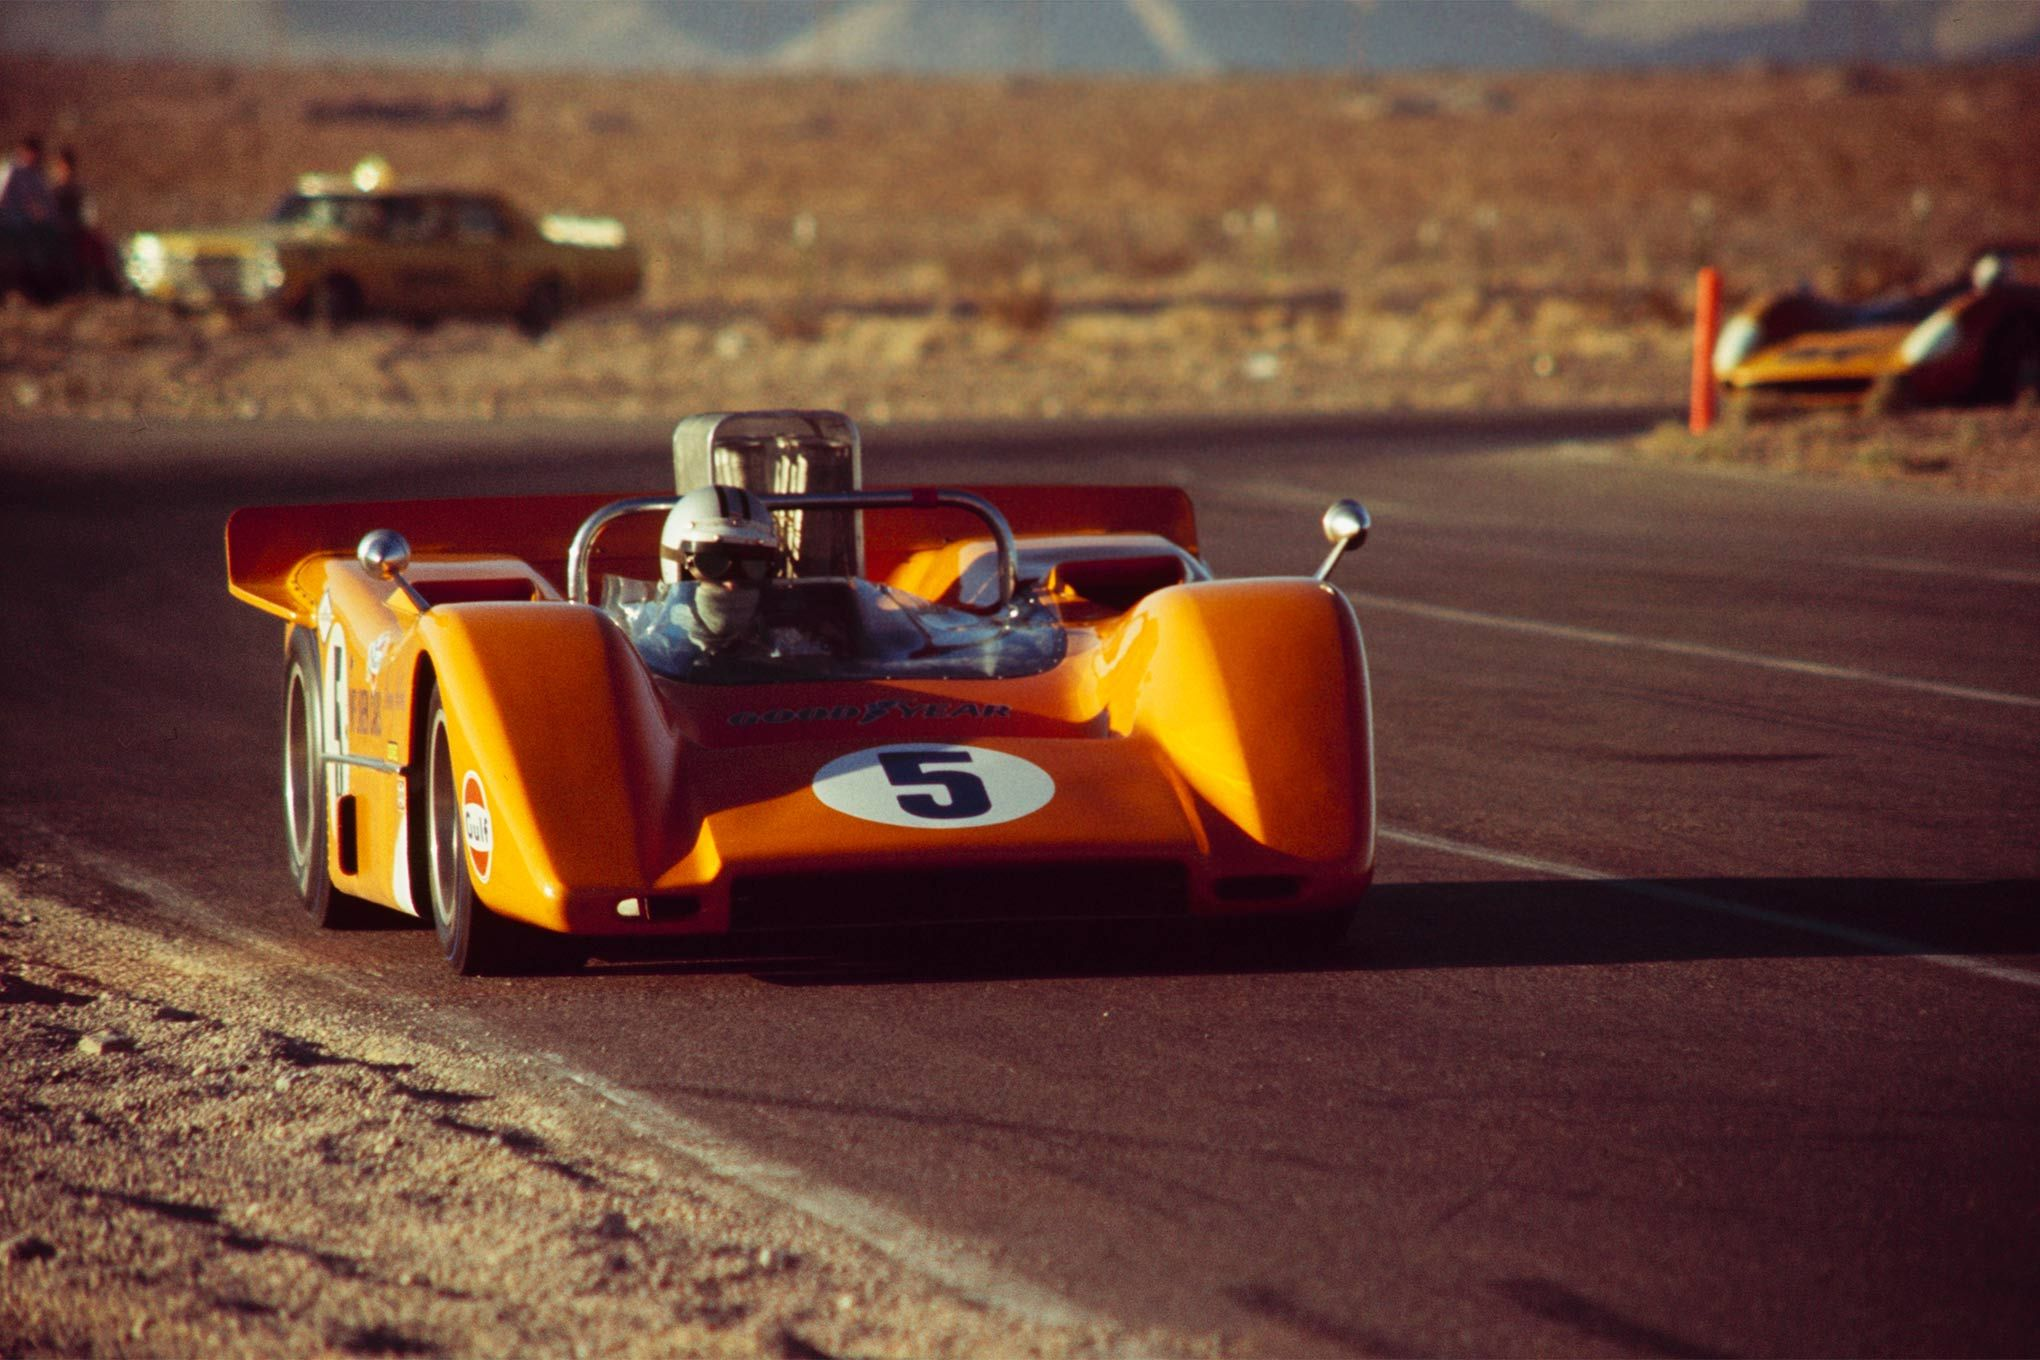 Denny Hulme Mclaren M8a Chevrolet Mclaren Cars Ltd Stardust Grand Prix Can Am Las Vegas 1968 Canadian America Racing Sports Car Racing Mclaren Cars